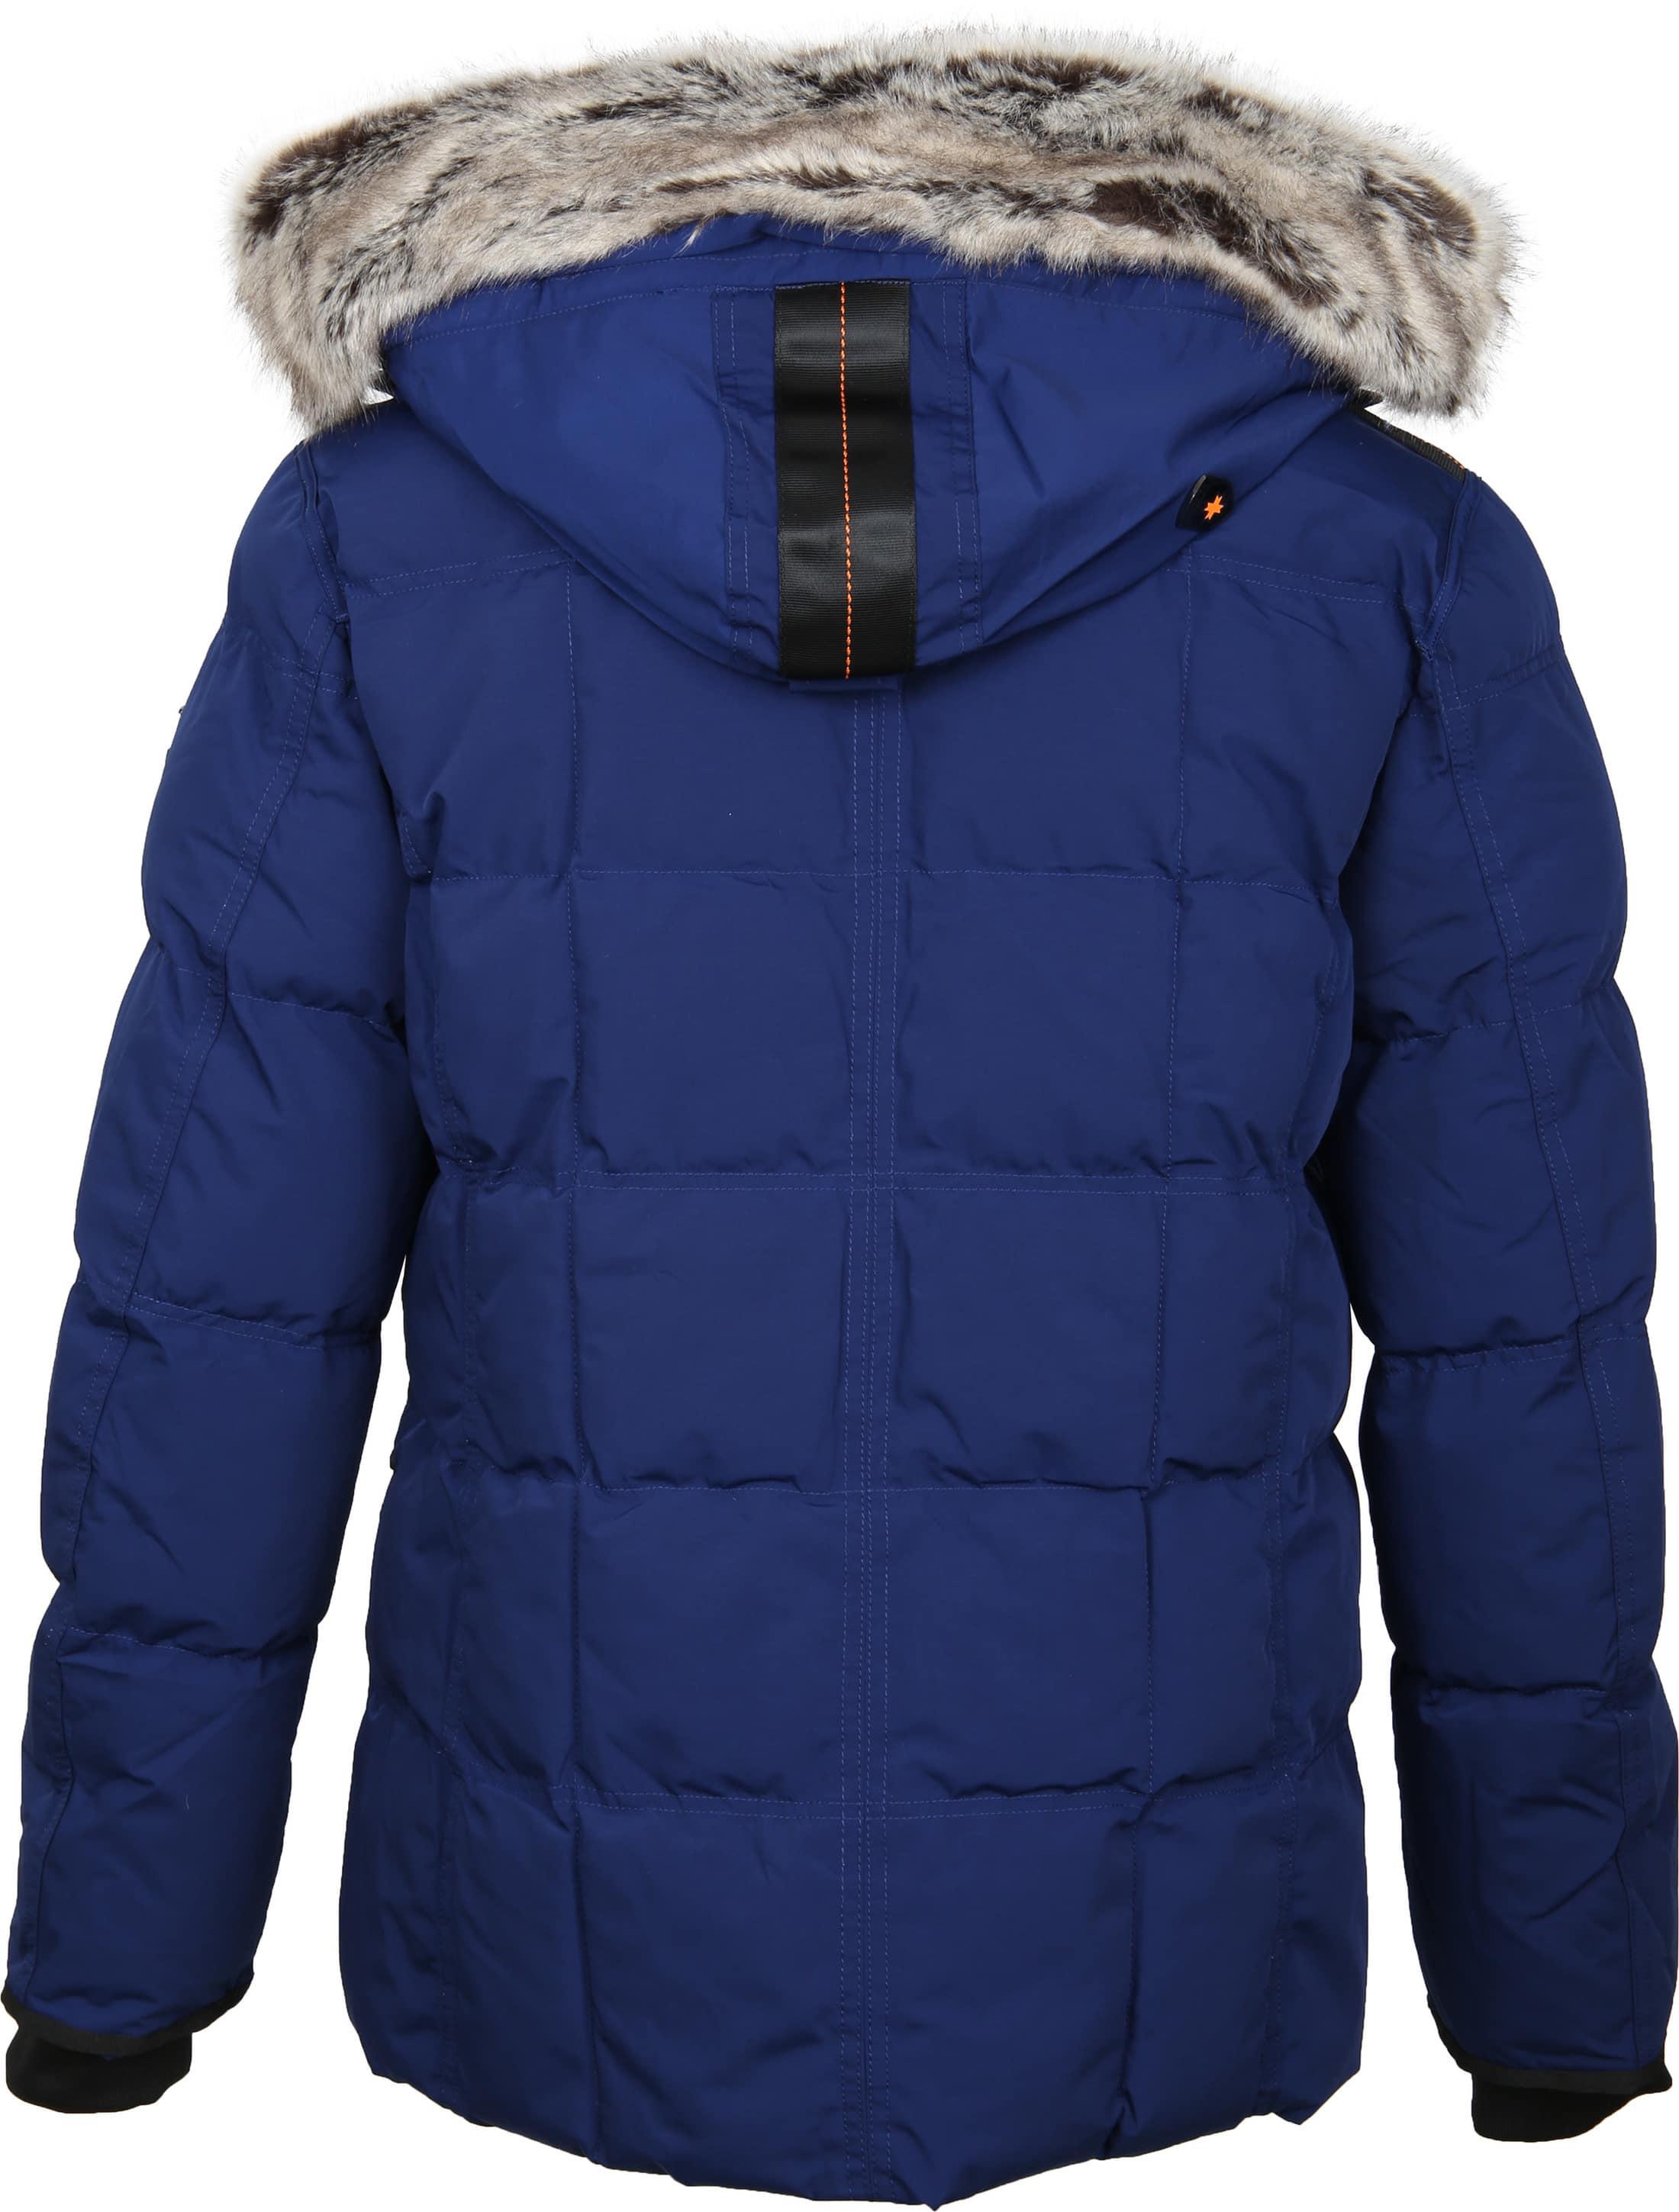 Wellensteyn Marvelous Jacket Blue foto 8